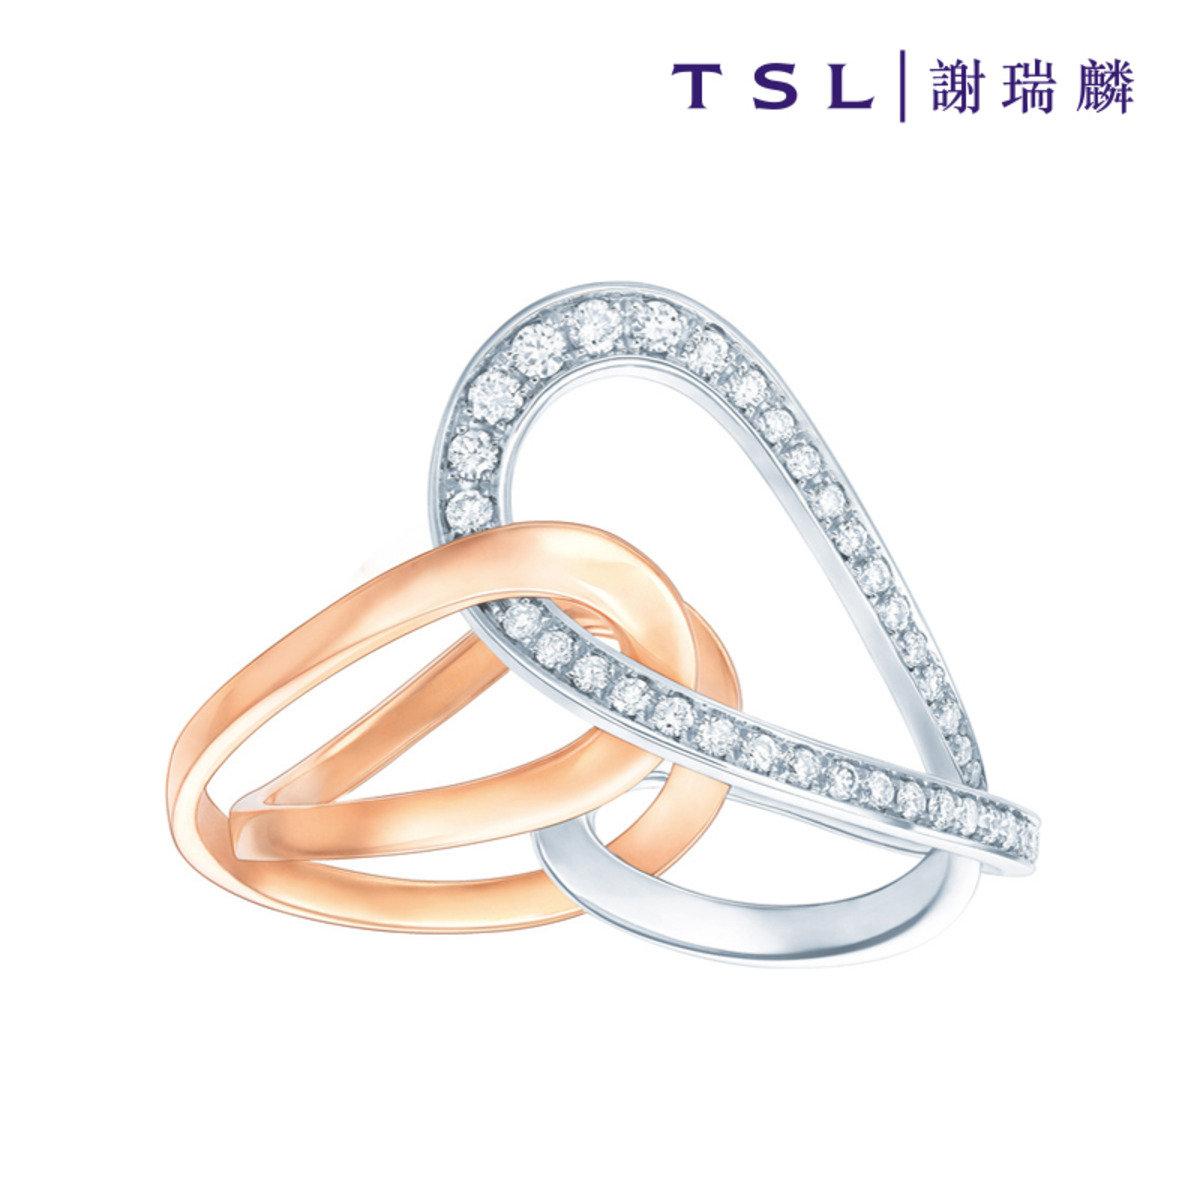 750/18K金鑲天然鑽石戒指